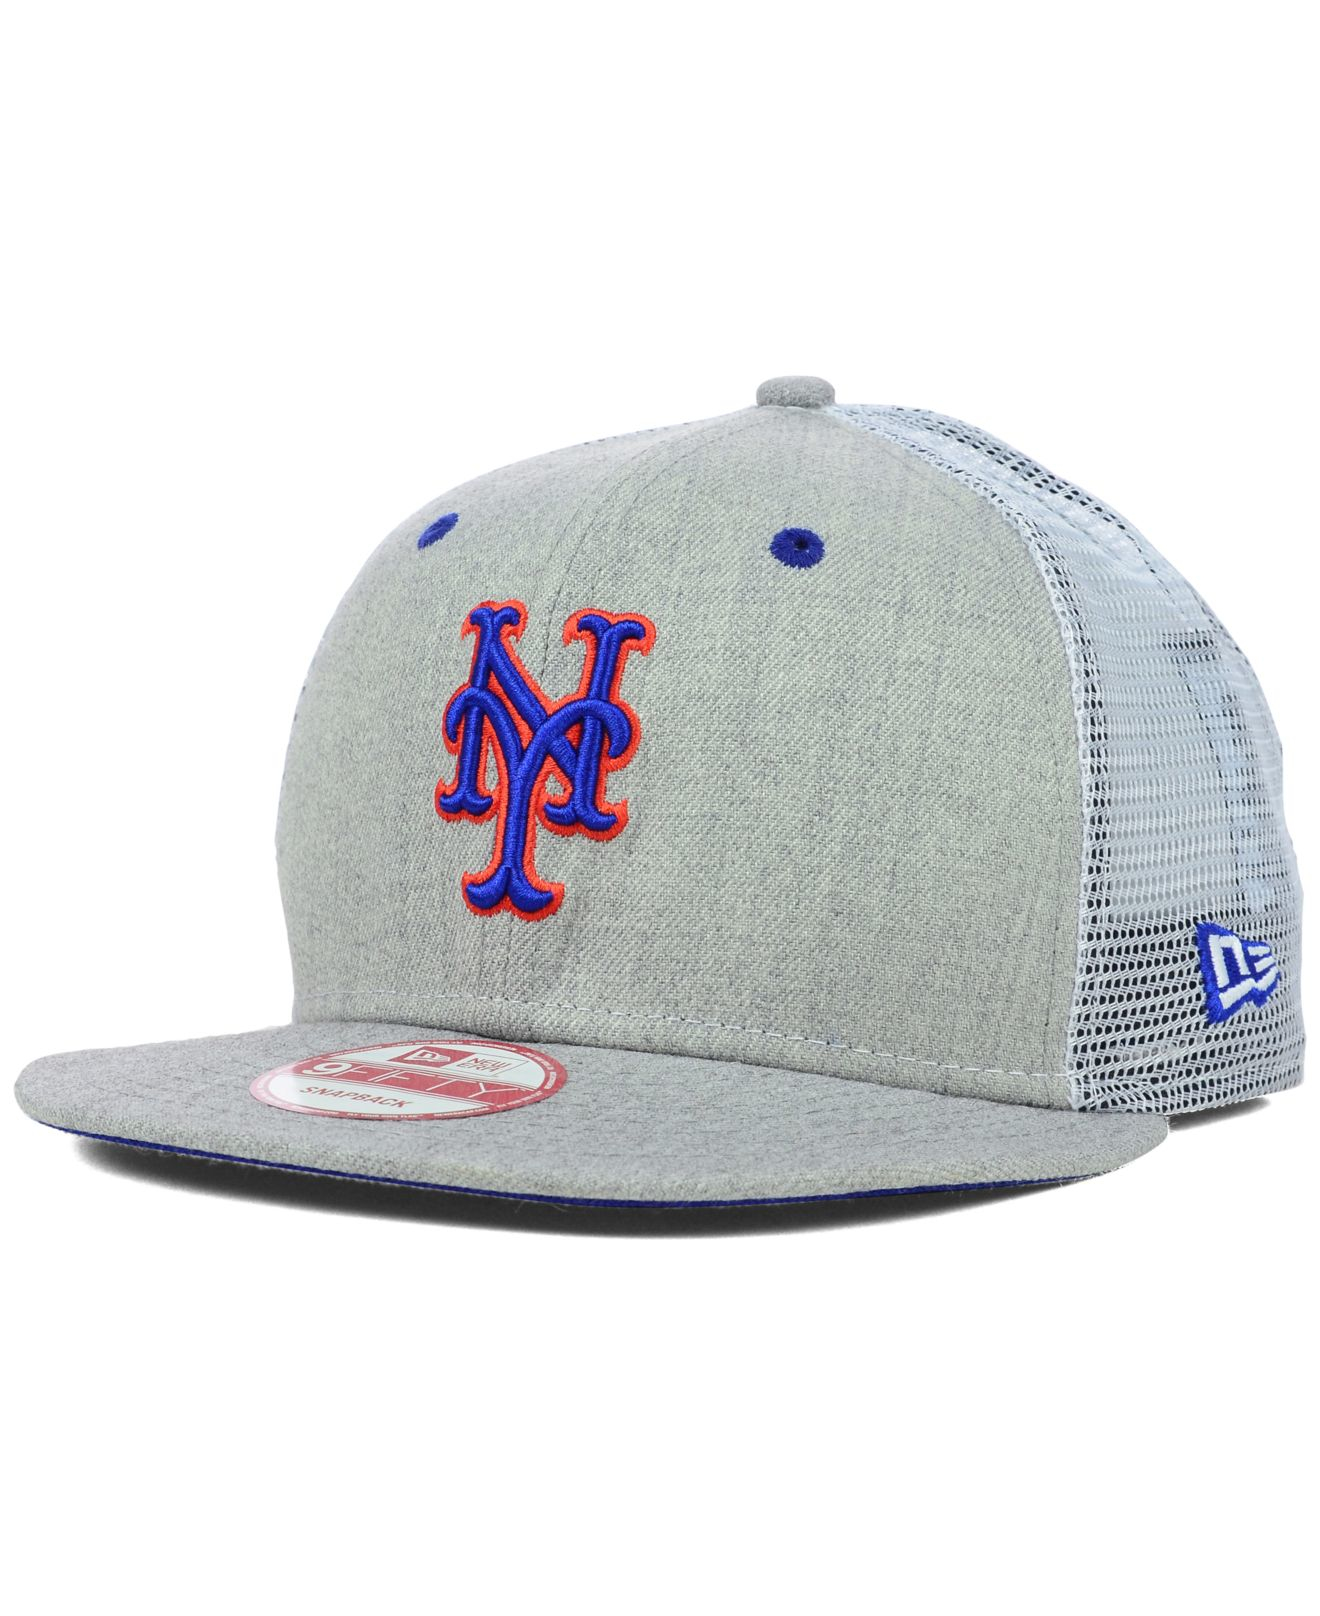 buy popular 103d5 5a3a3 ... italy lyst ktz new york mets heather trucker 9fifty snapback cap in  gray 790ed 378bd